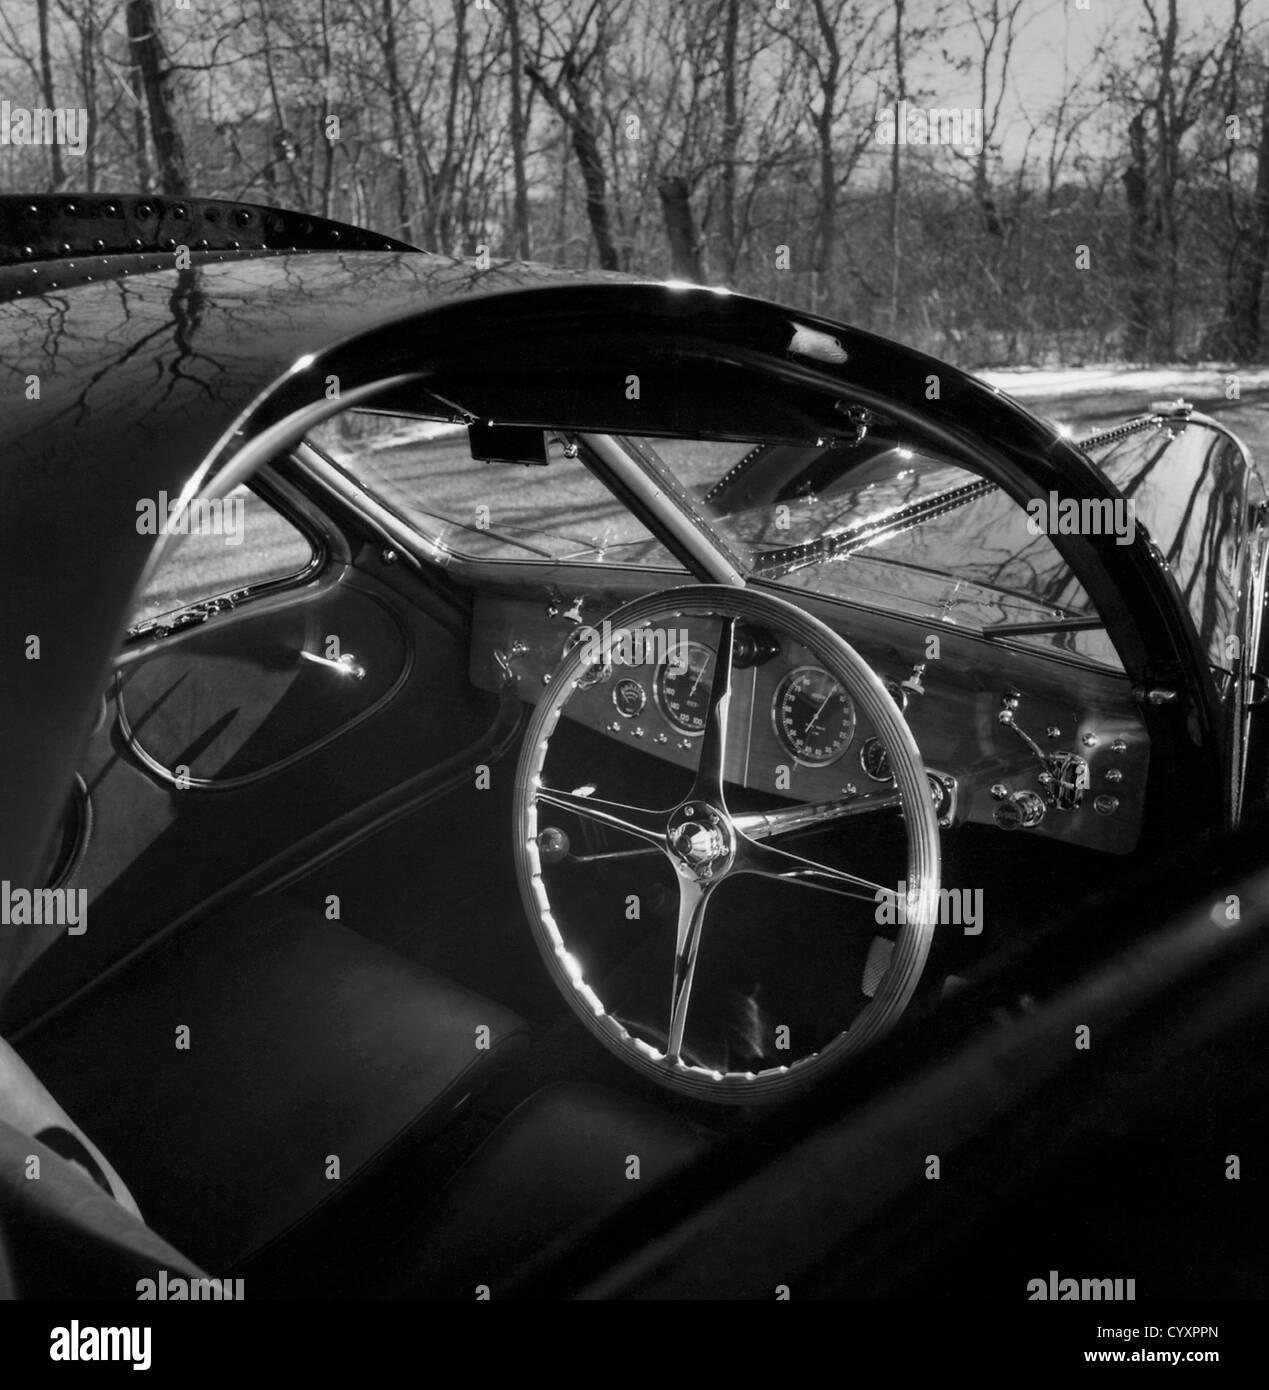 1938 Bugatti Type 57sc Atlantic Coupe Stock Photo Alamy